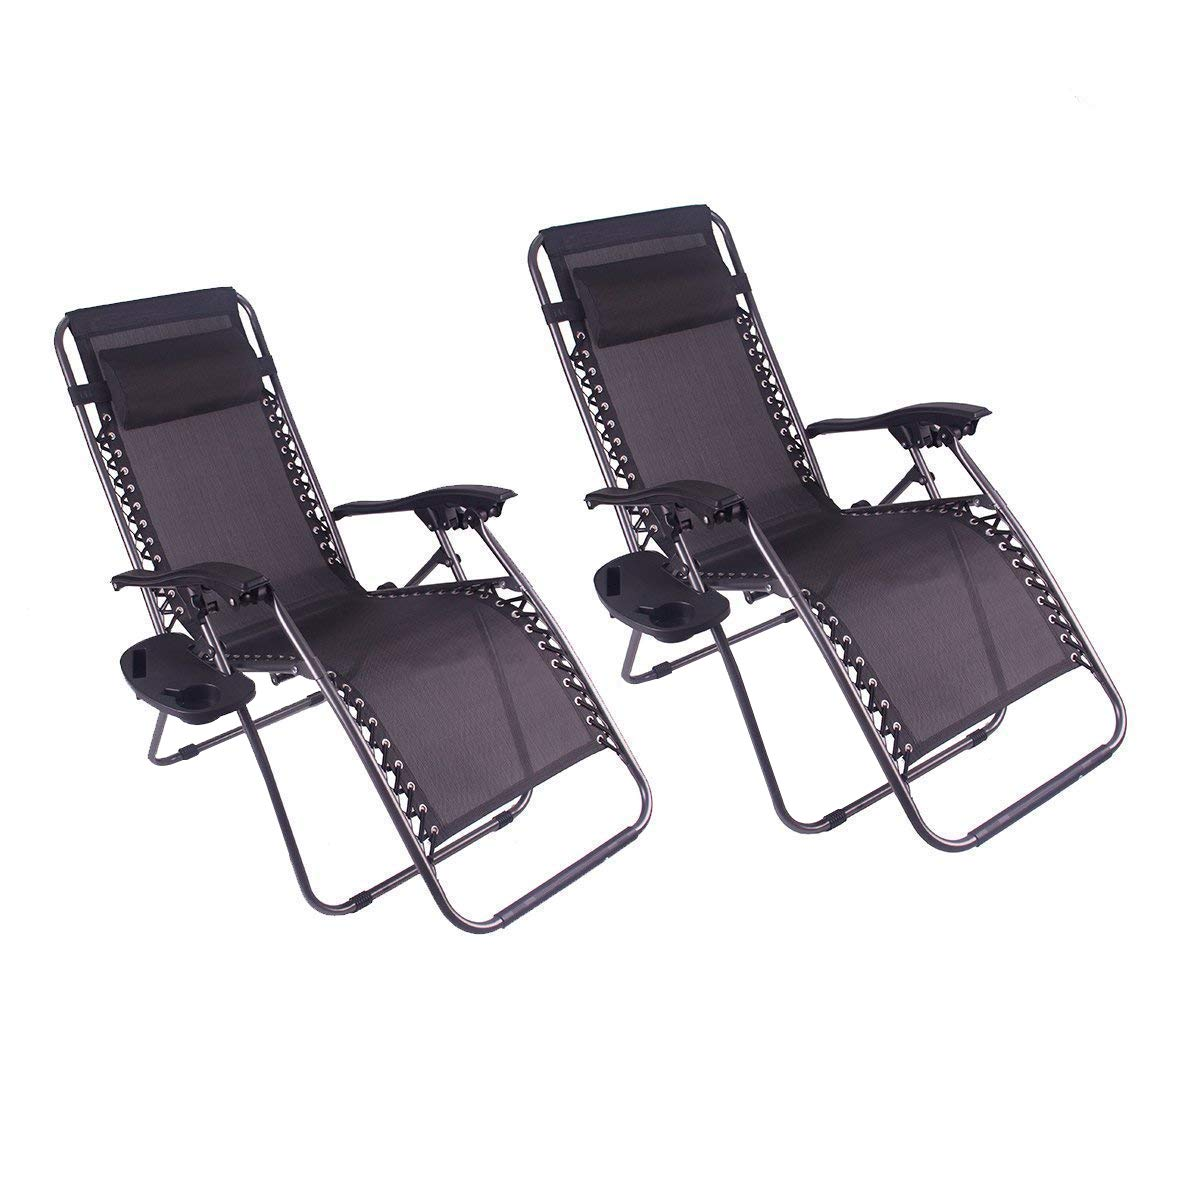 Polar Aurora Zero Gravity Chairs Recliner Lounge Patio Chairs Folding Cup Holder 2 Pack(Black) by Polar Aurora